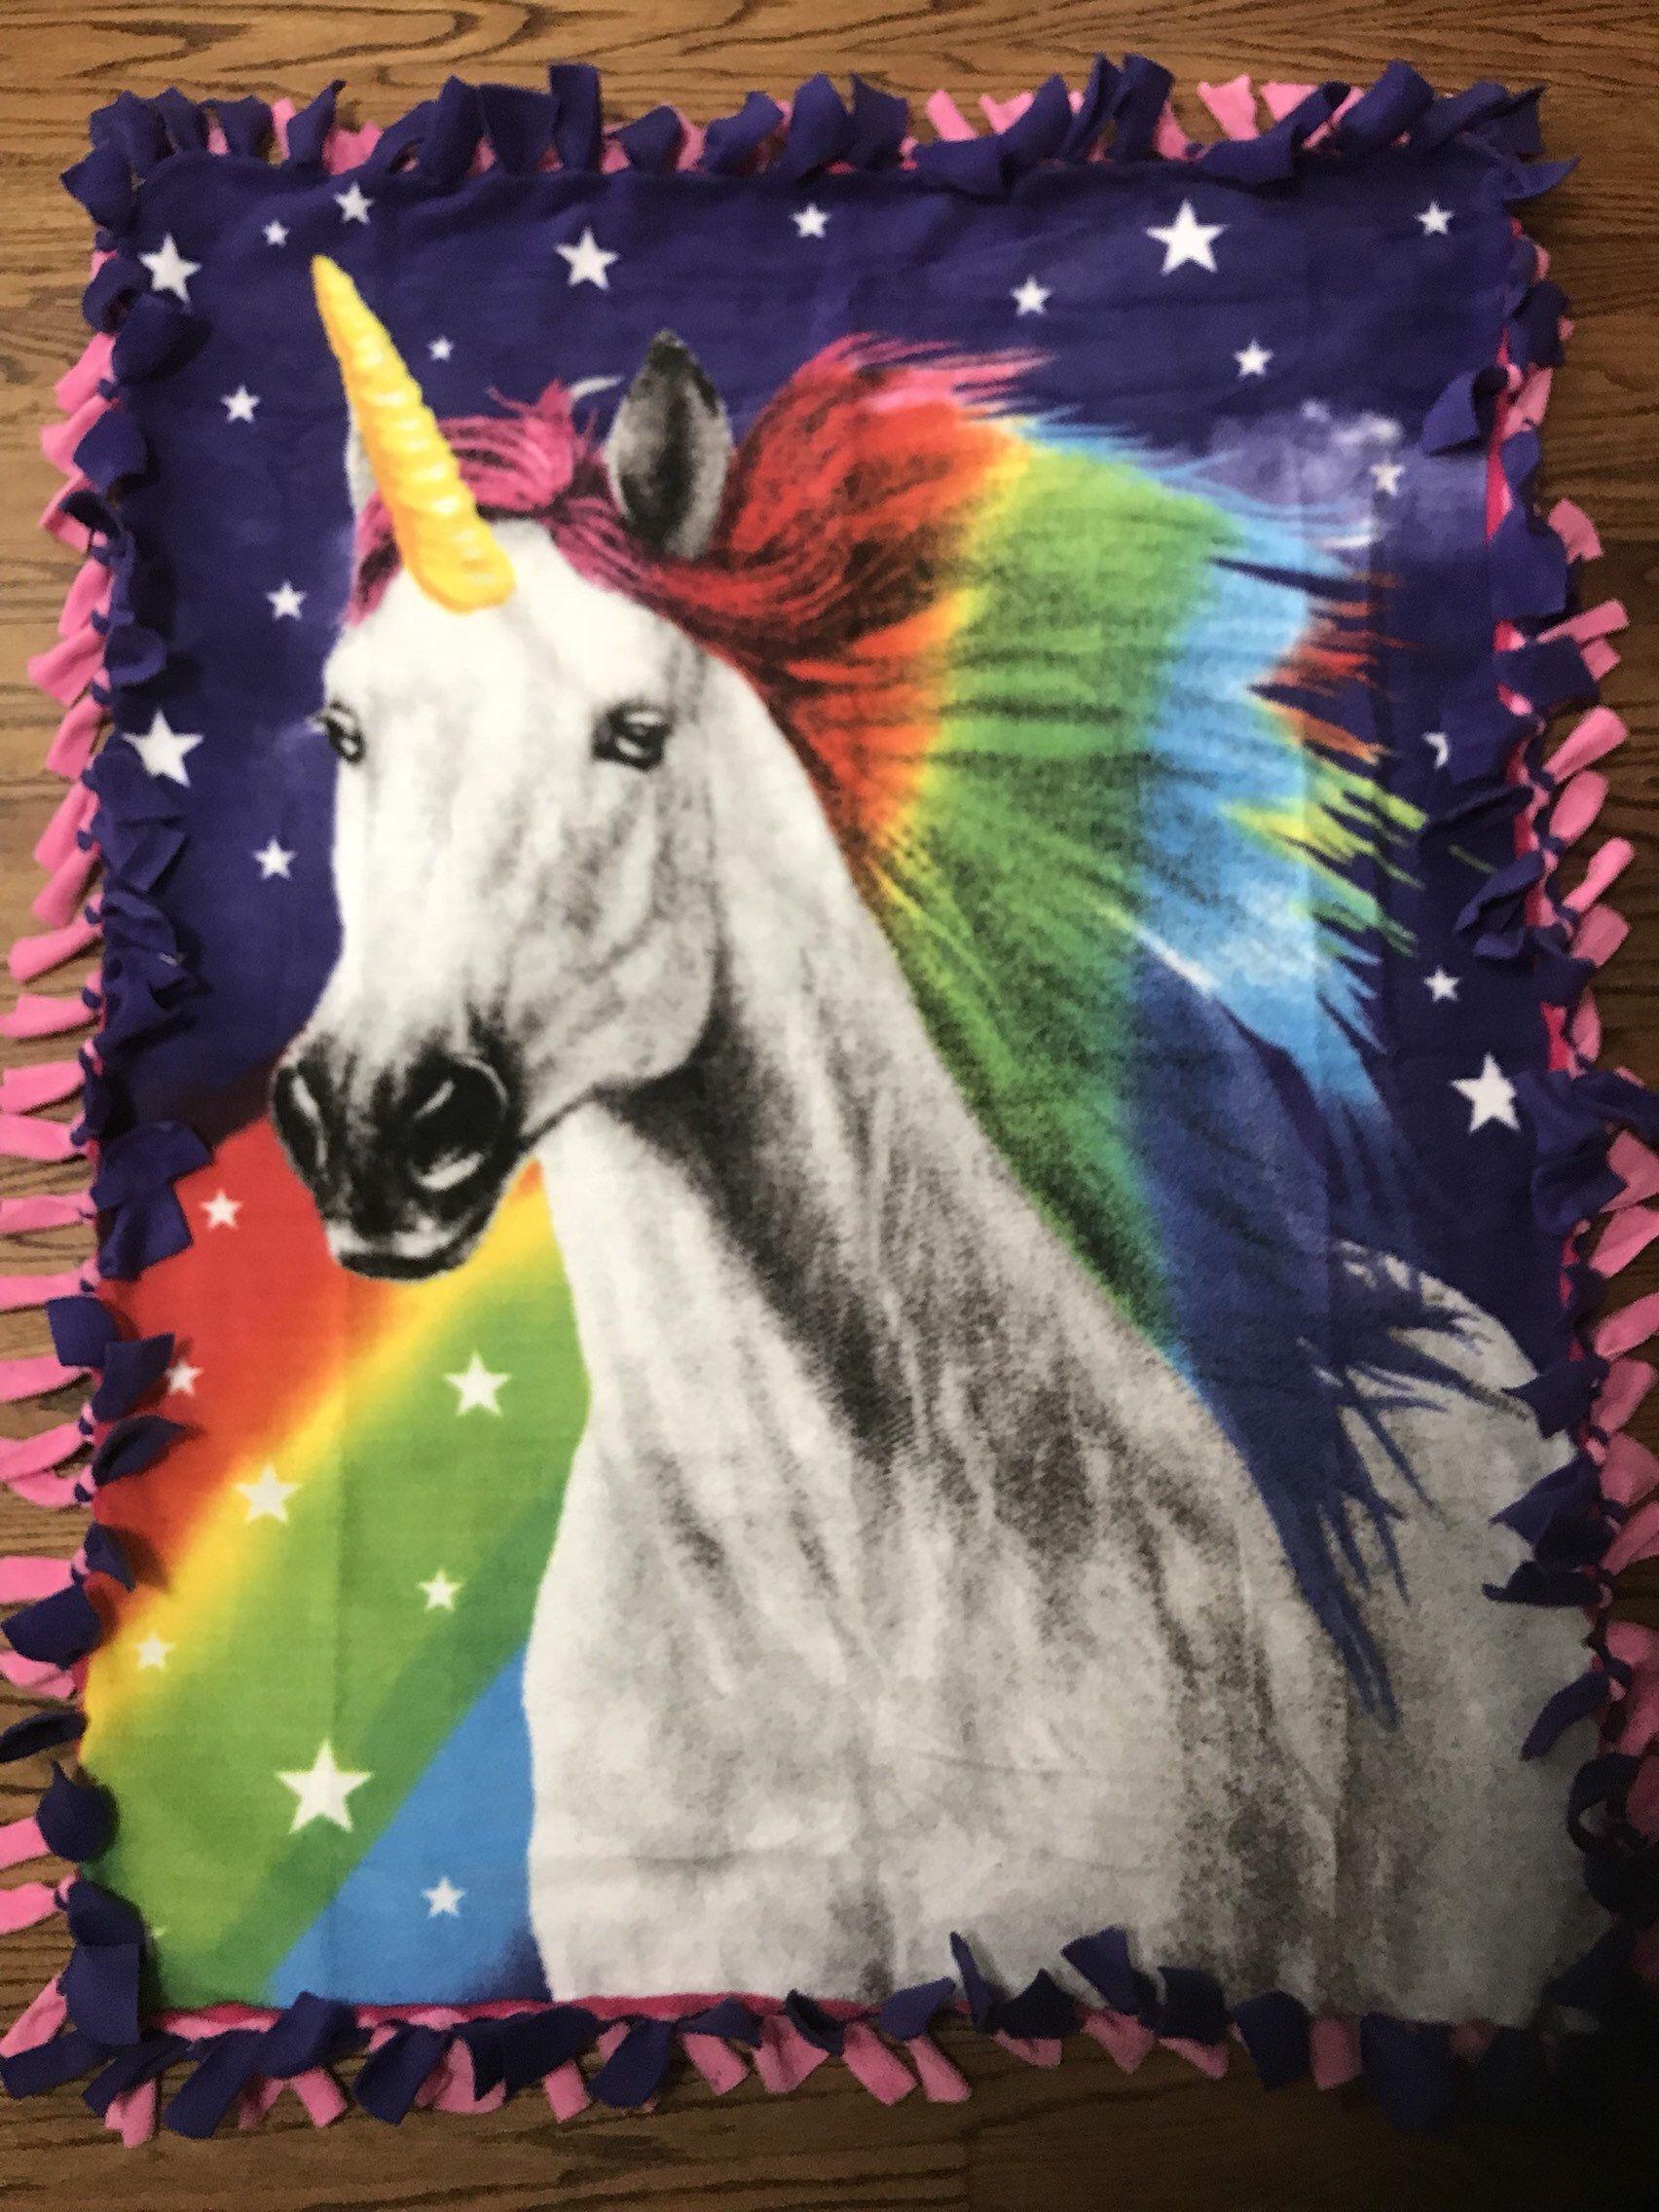 Unicorn fleece tie blanket in everydaysaholiday